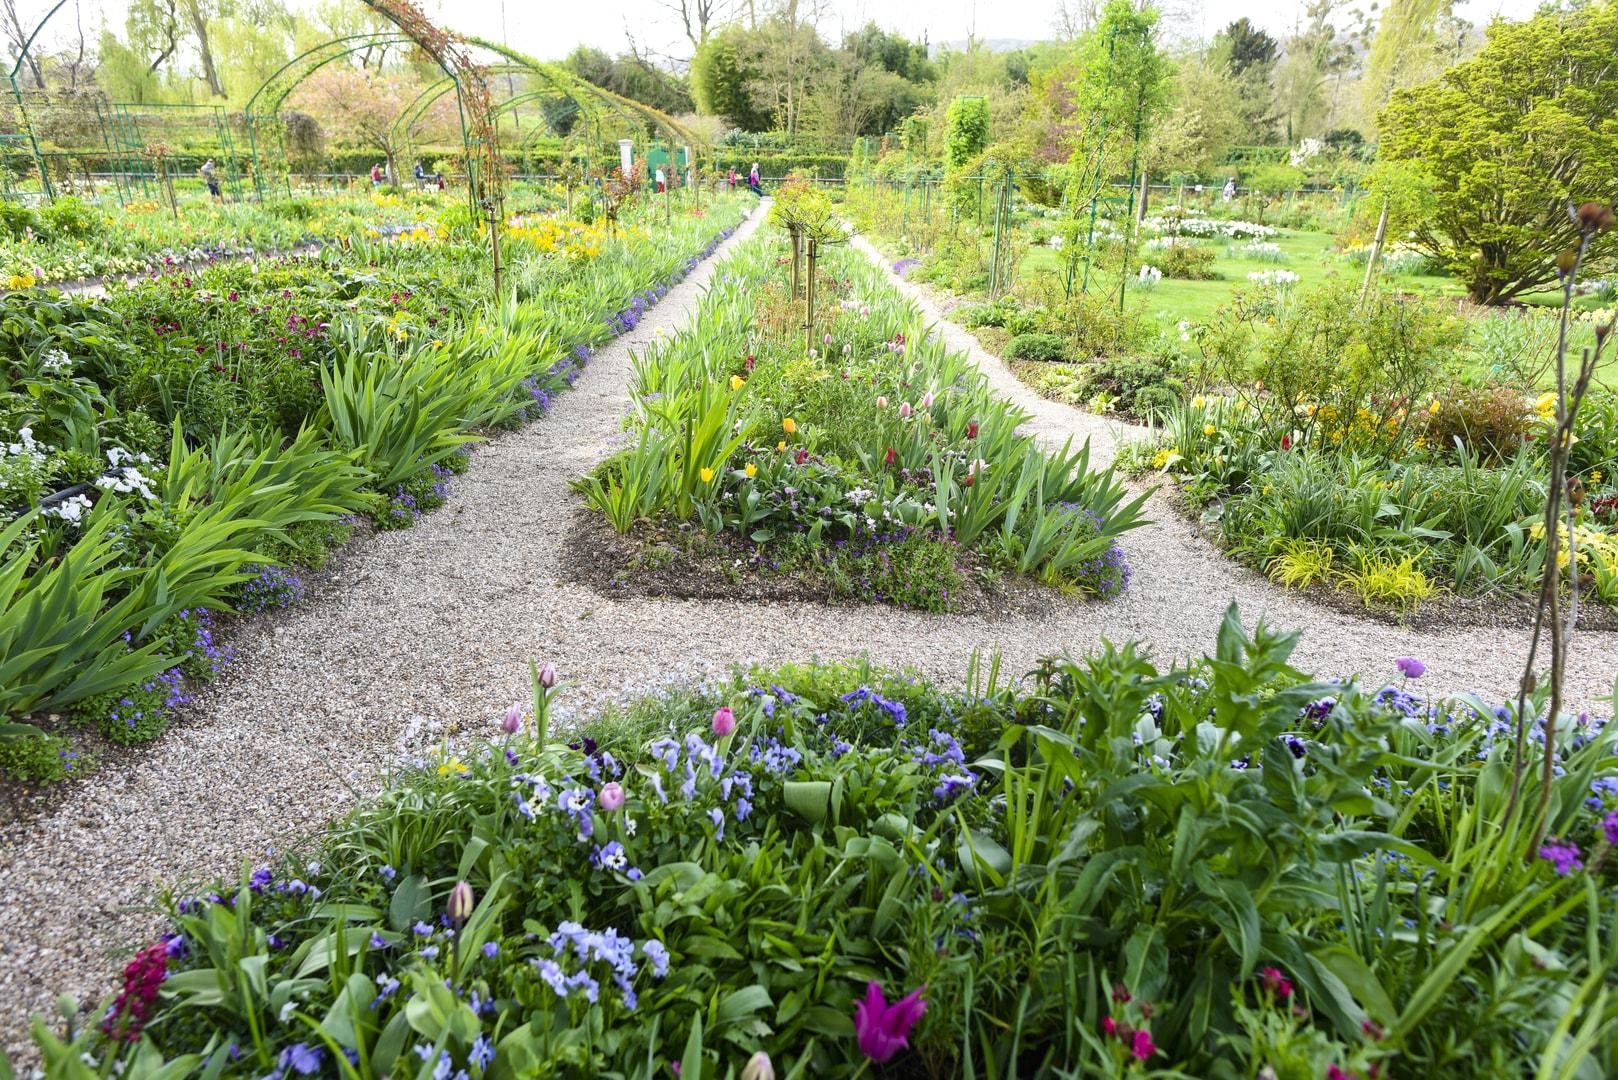 Monet's garden excursion